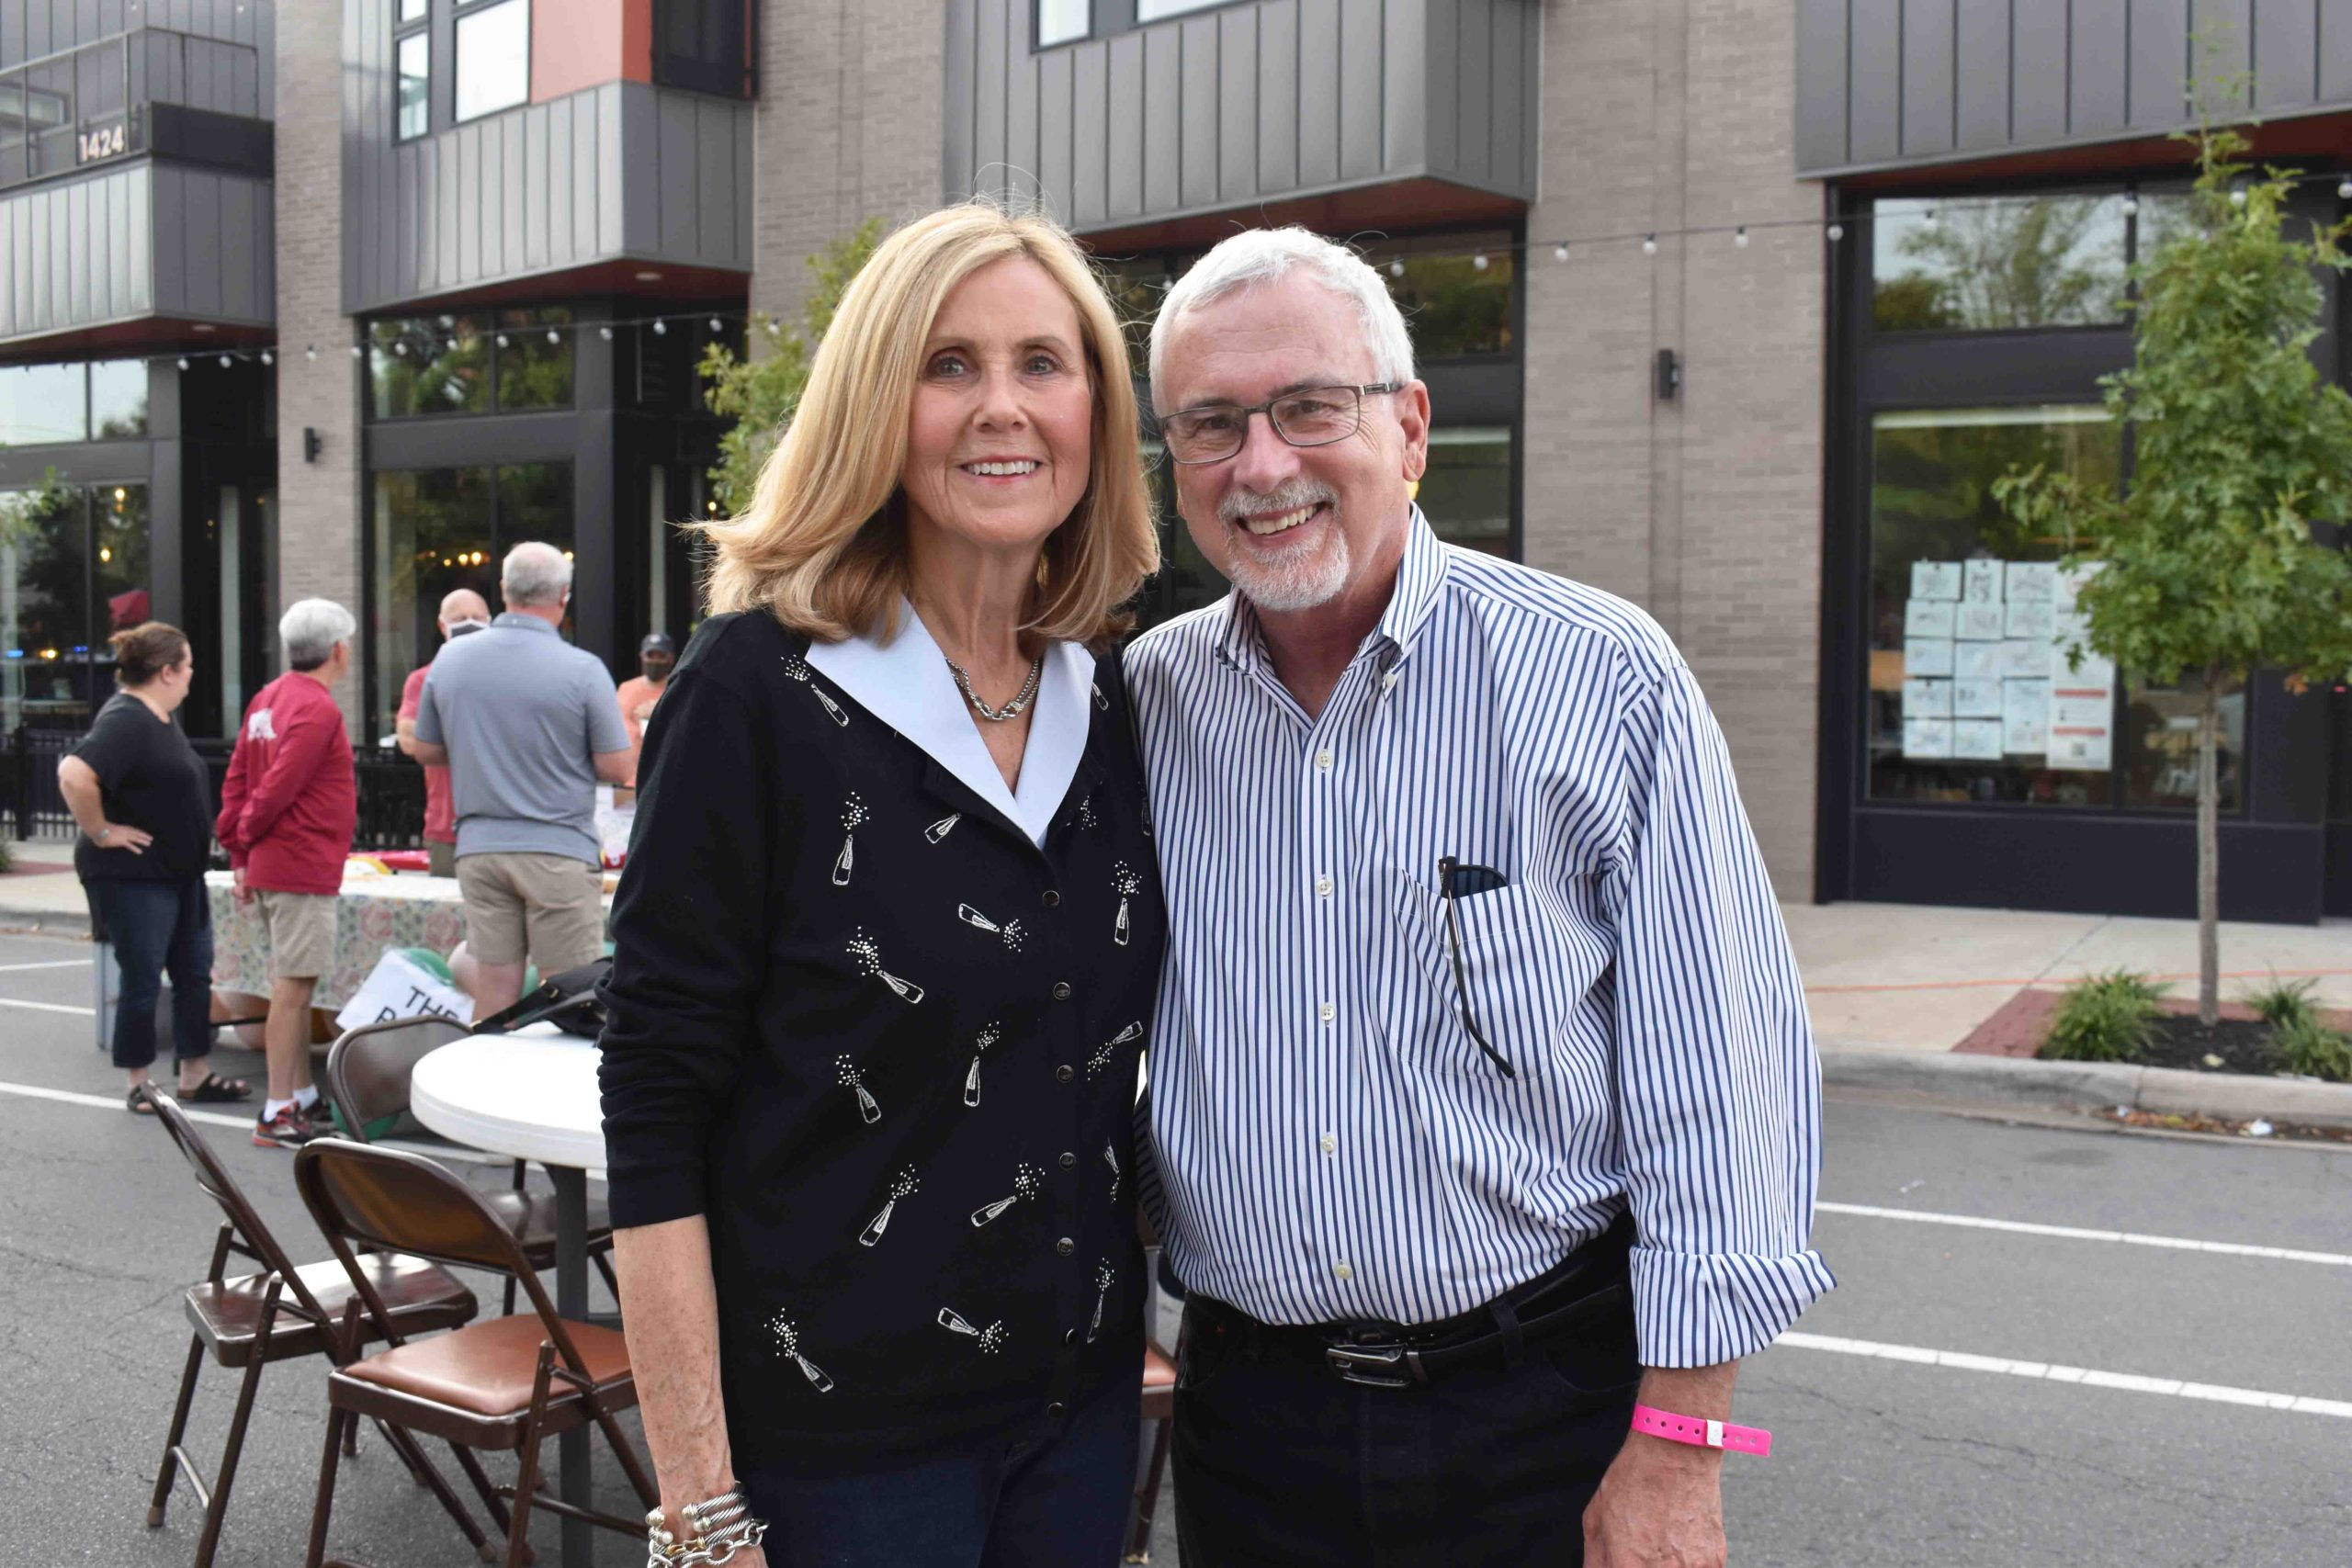 Shelia and Judge Larry Vaught